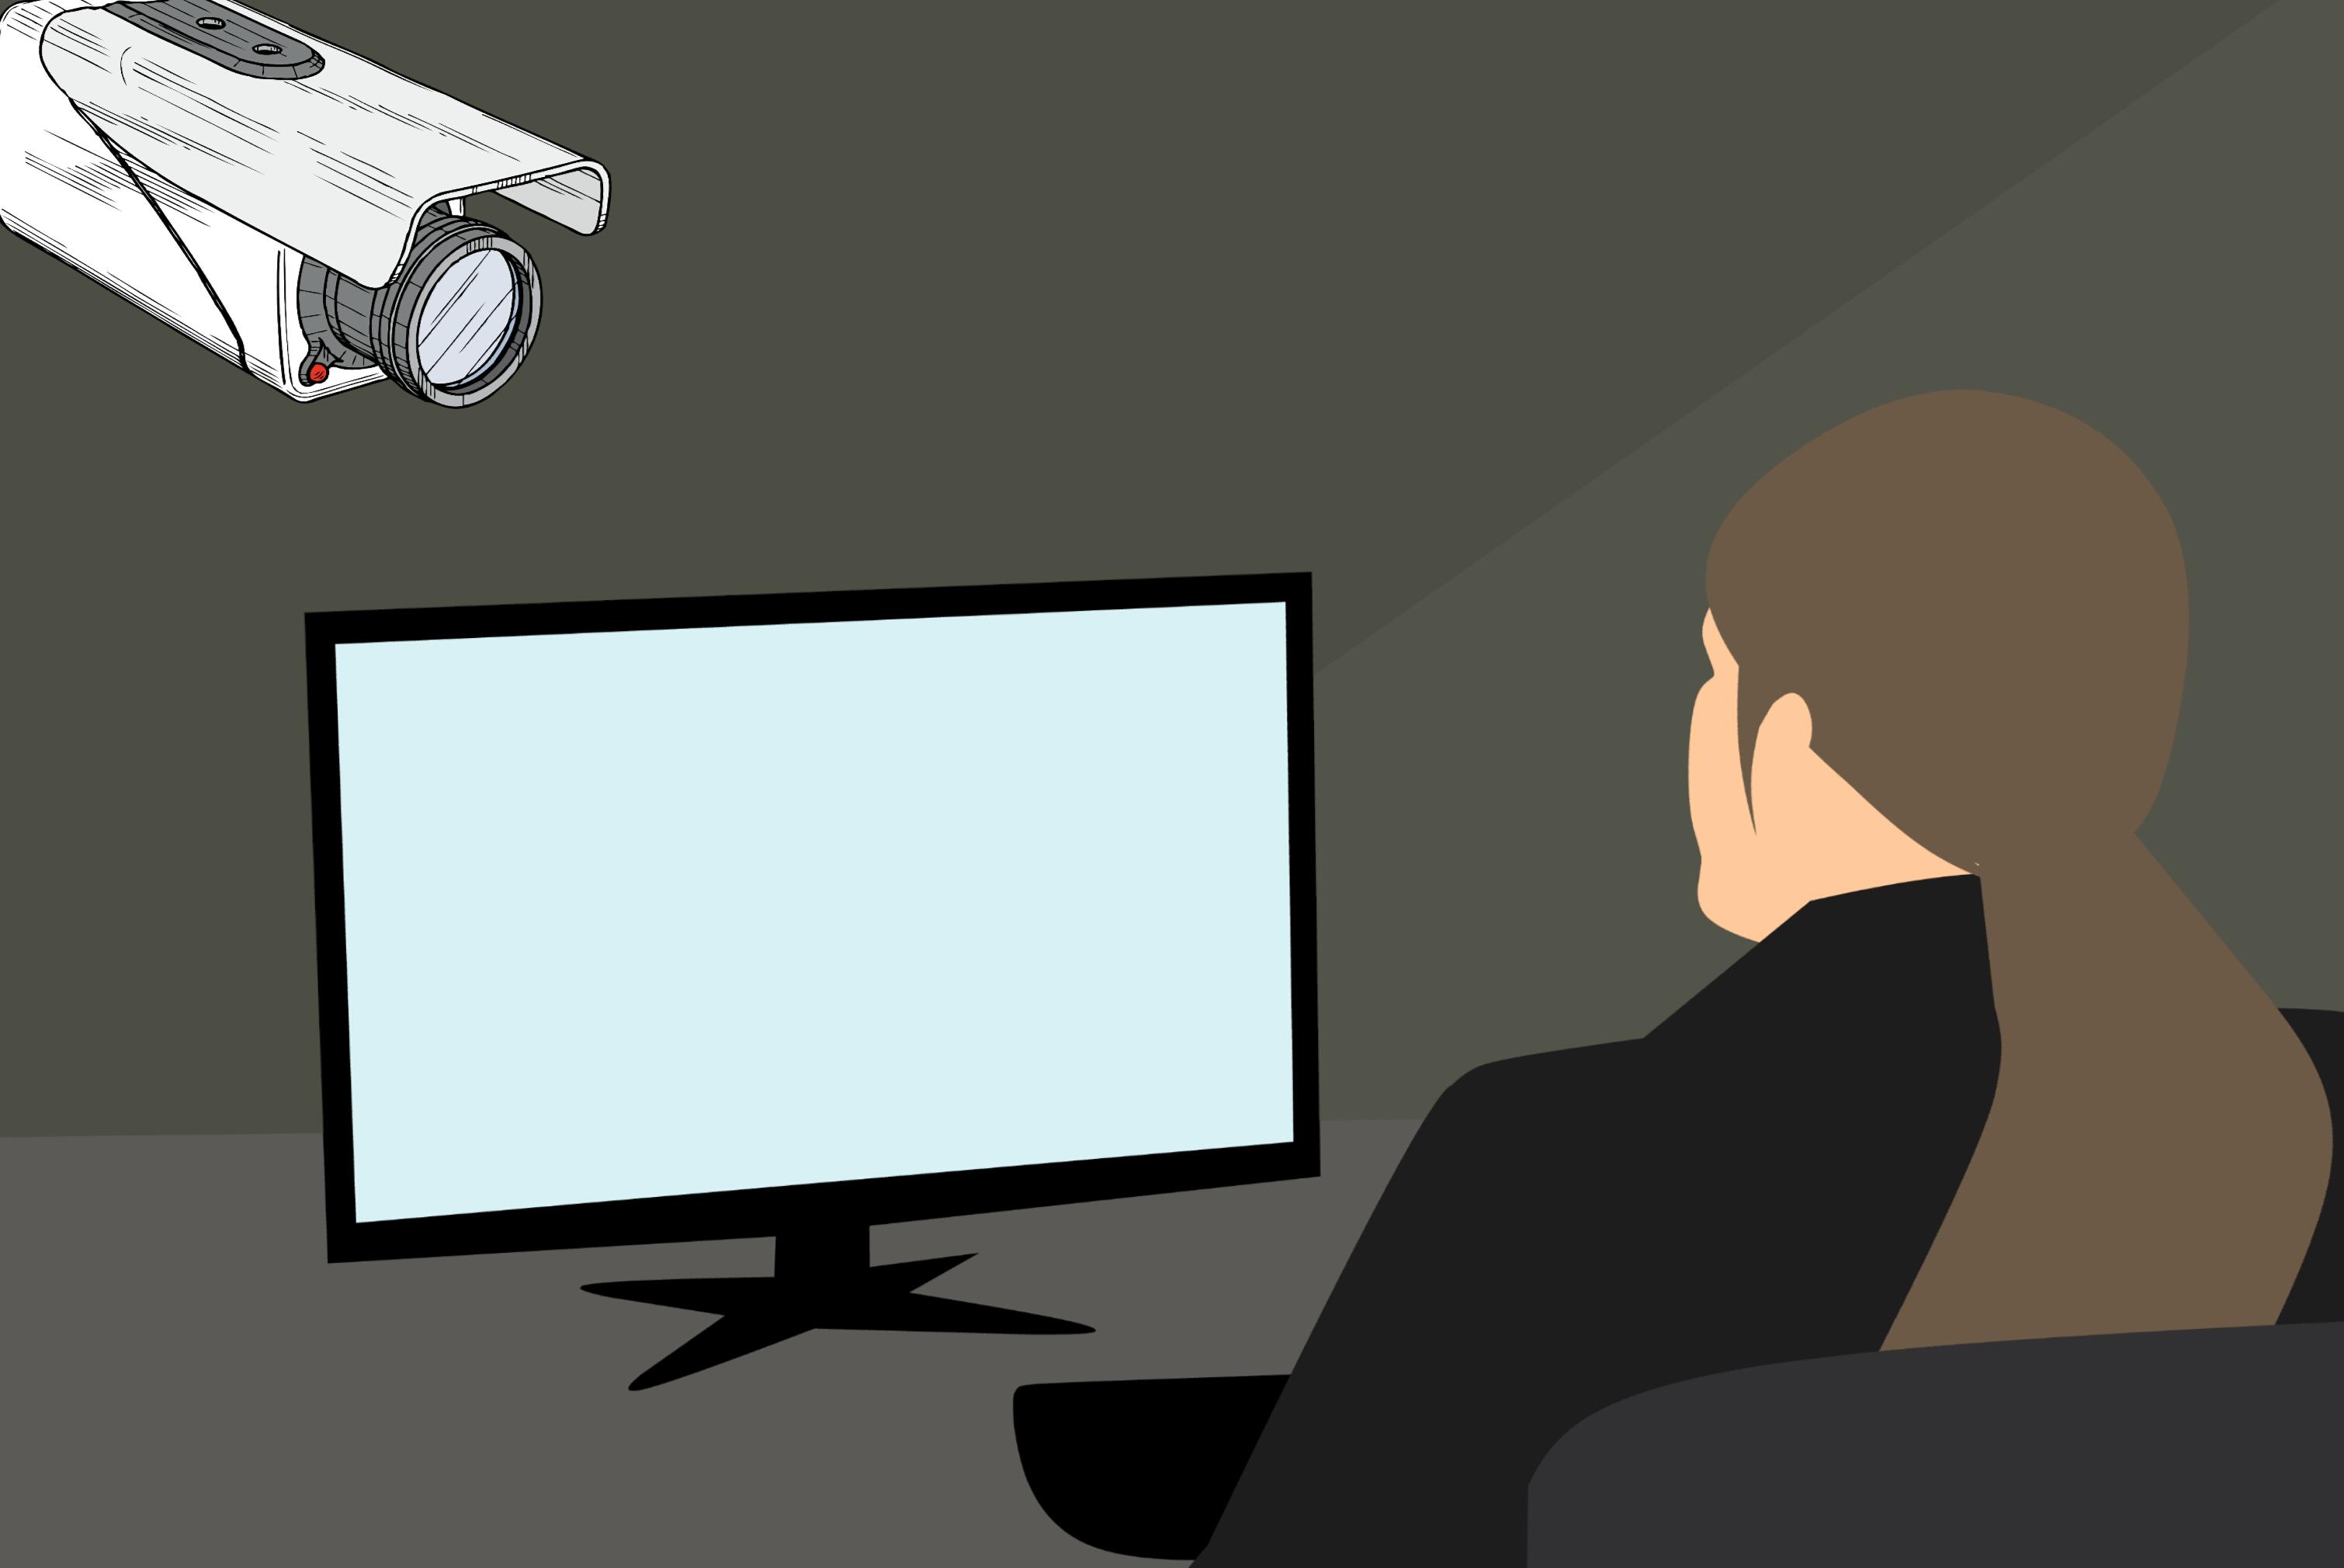 Free Images Cctv Security Camera Video Camera Surveillance